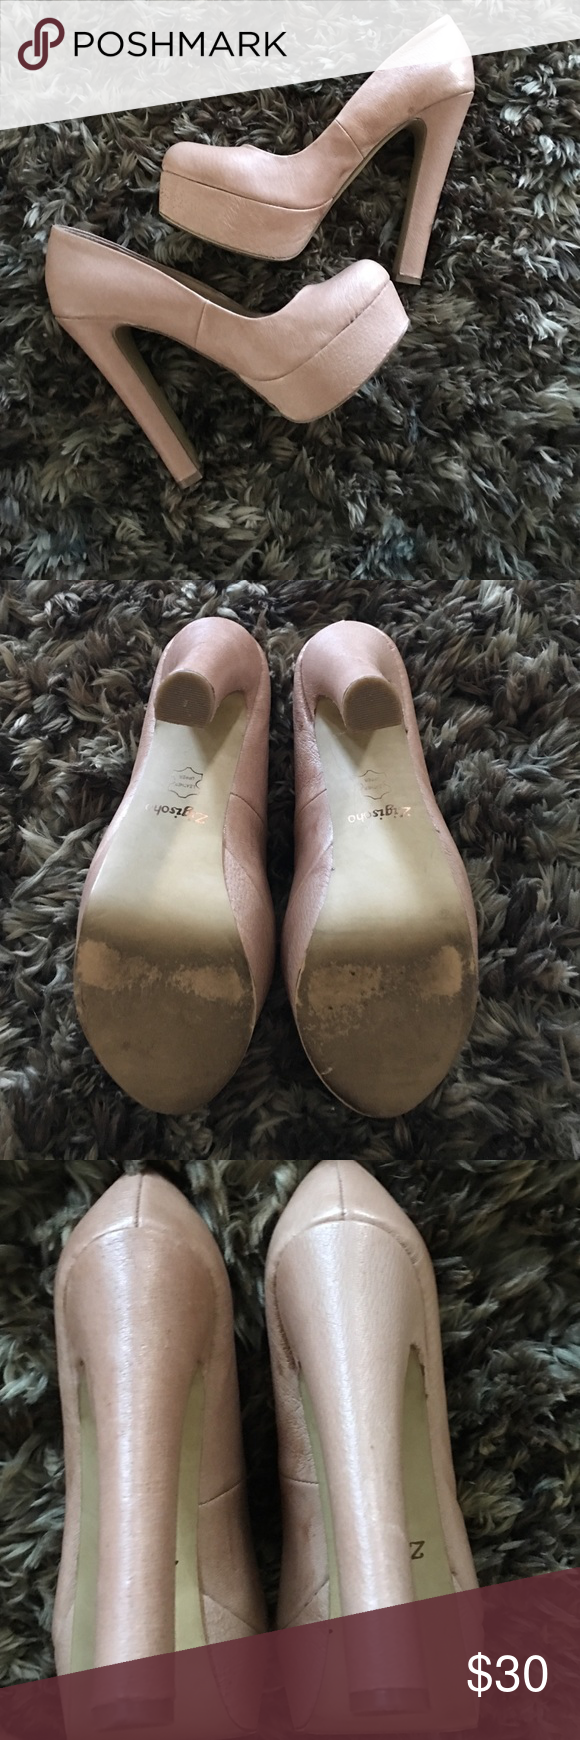 Tan pumps Worn twice tan/nude pumps Zigi Soho Shoes Platforms